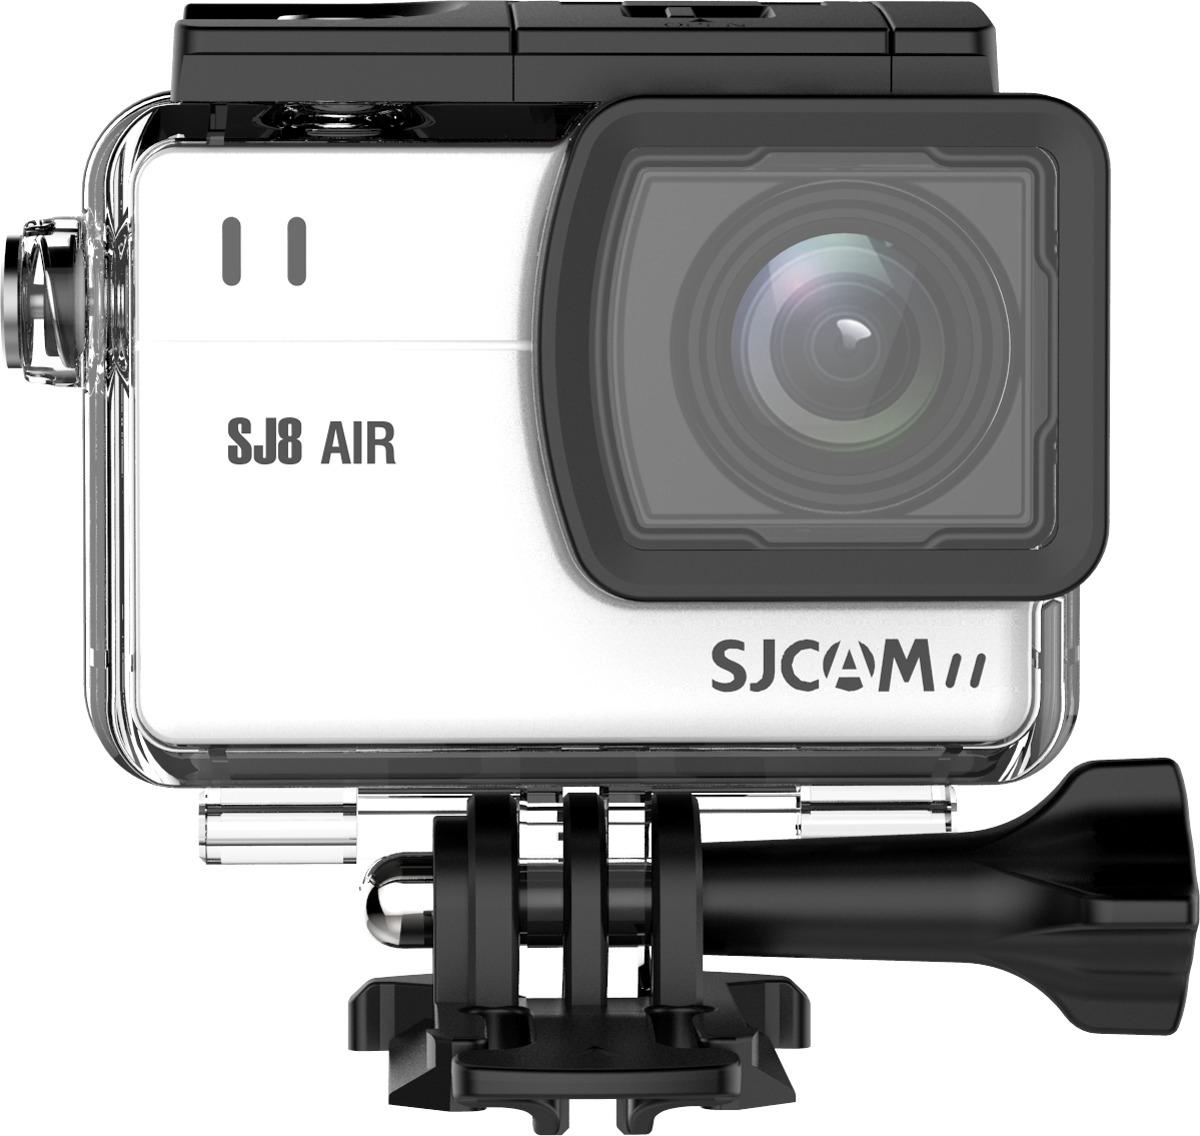 Экшн-камера SJCAM SJ8 Air, SJ8 Air (white), серебристый original sjcam sj8 pro 4k 60fps wifi action camera